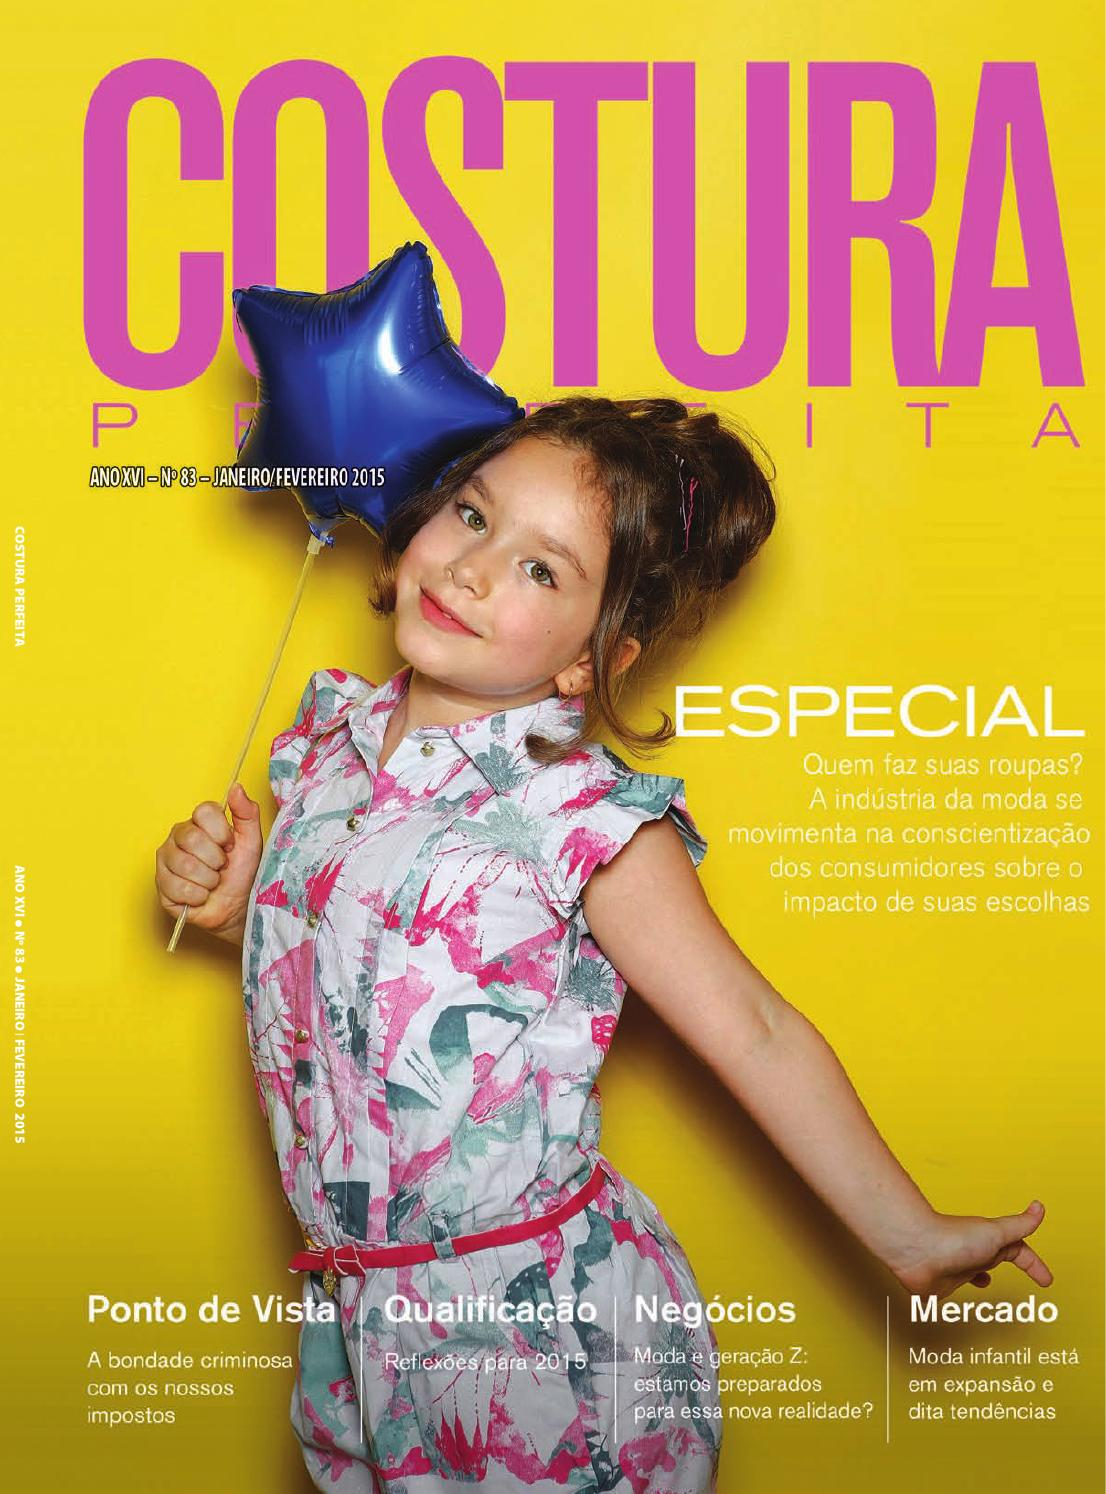 9bcf1c11a Revista Costura Perfeita Ano XVI n°83 Janeiro Fevereiro 2015 by Costura  Perfeita - issuu